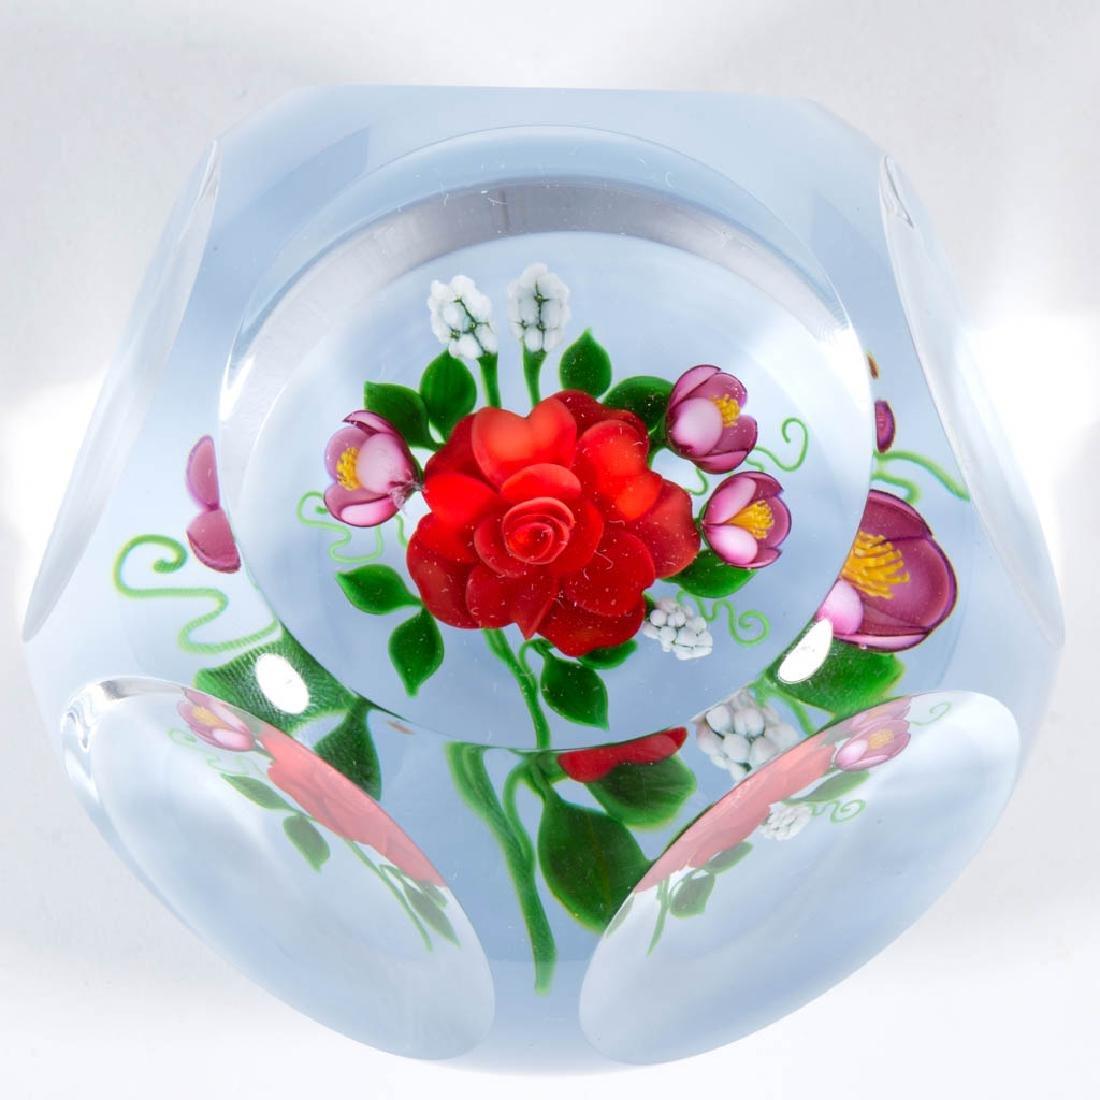 VICTOR TRABUCCO FLOWER BOUQUET STUDIO ART GLASS - Oct 12